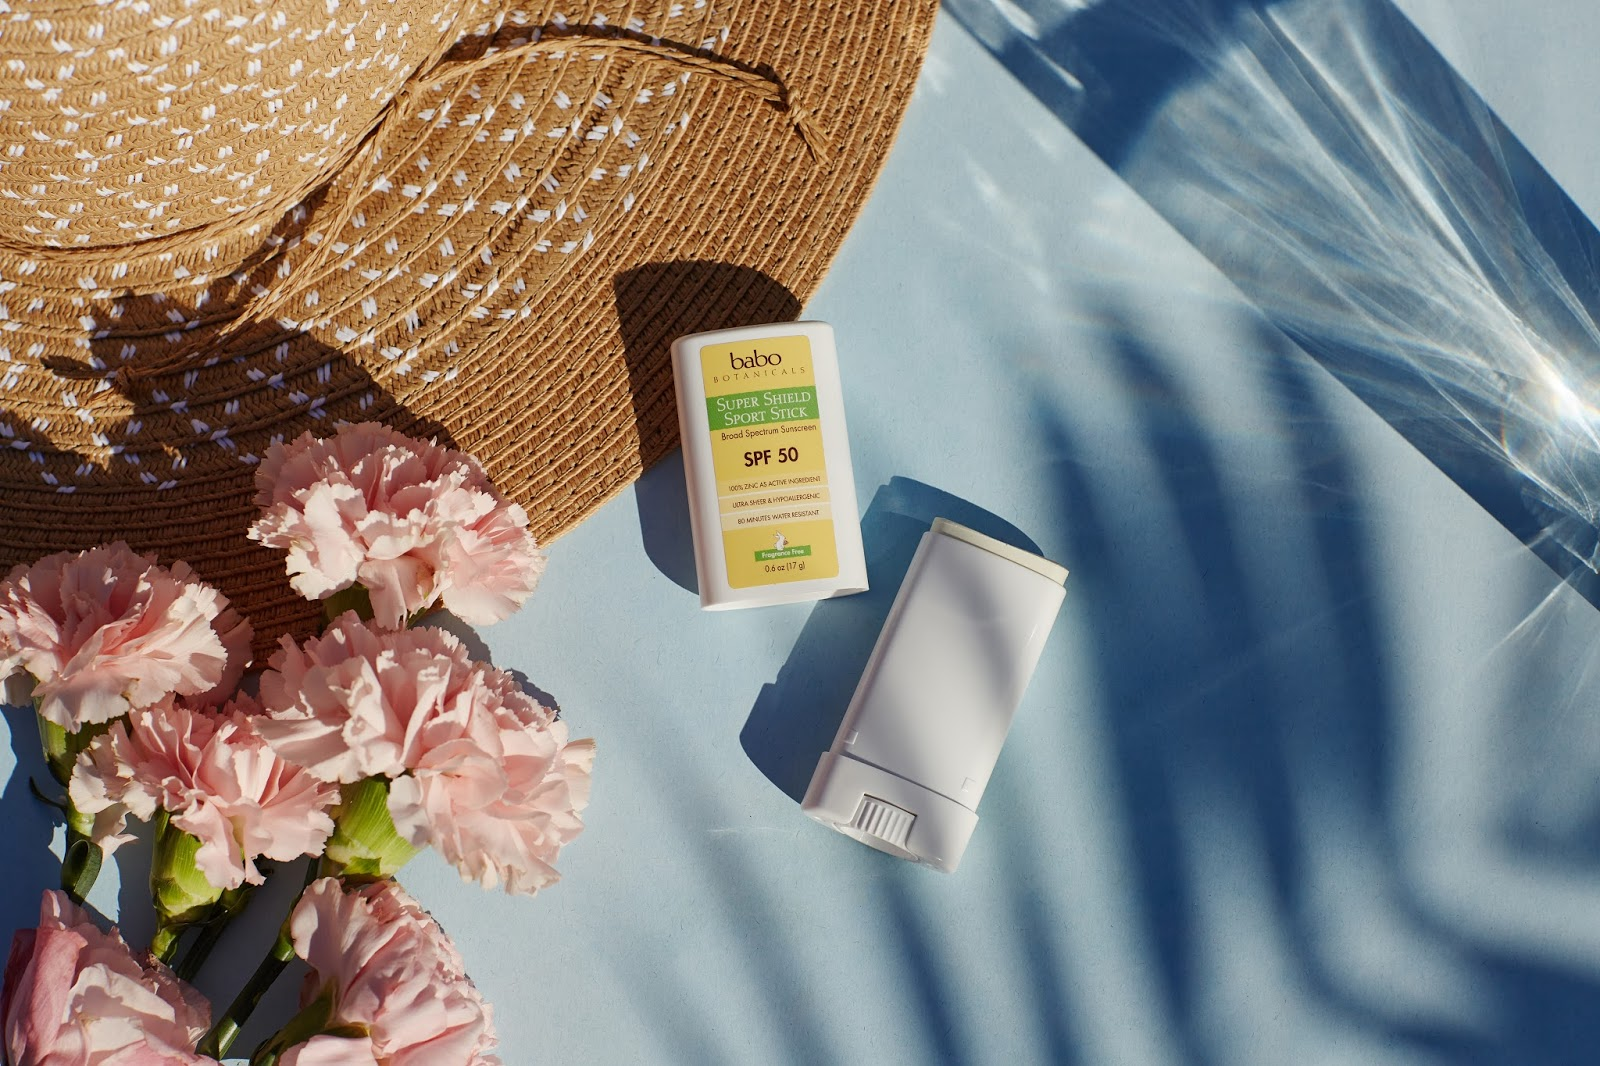 Babo Botanicals Super Shield Sport Stick SPF 50 natural zinc sunscreen organic nontoxic nan-nano waterproof hellolindasau